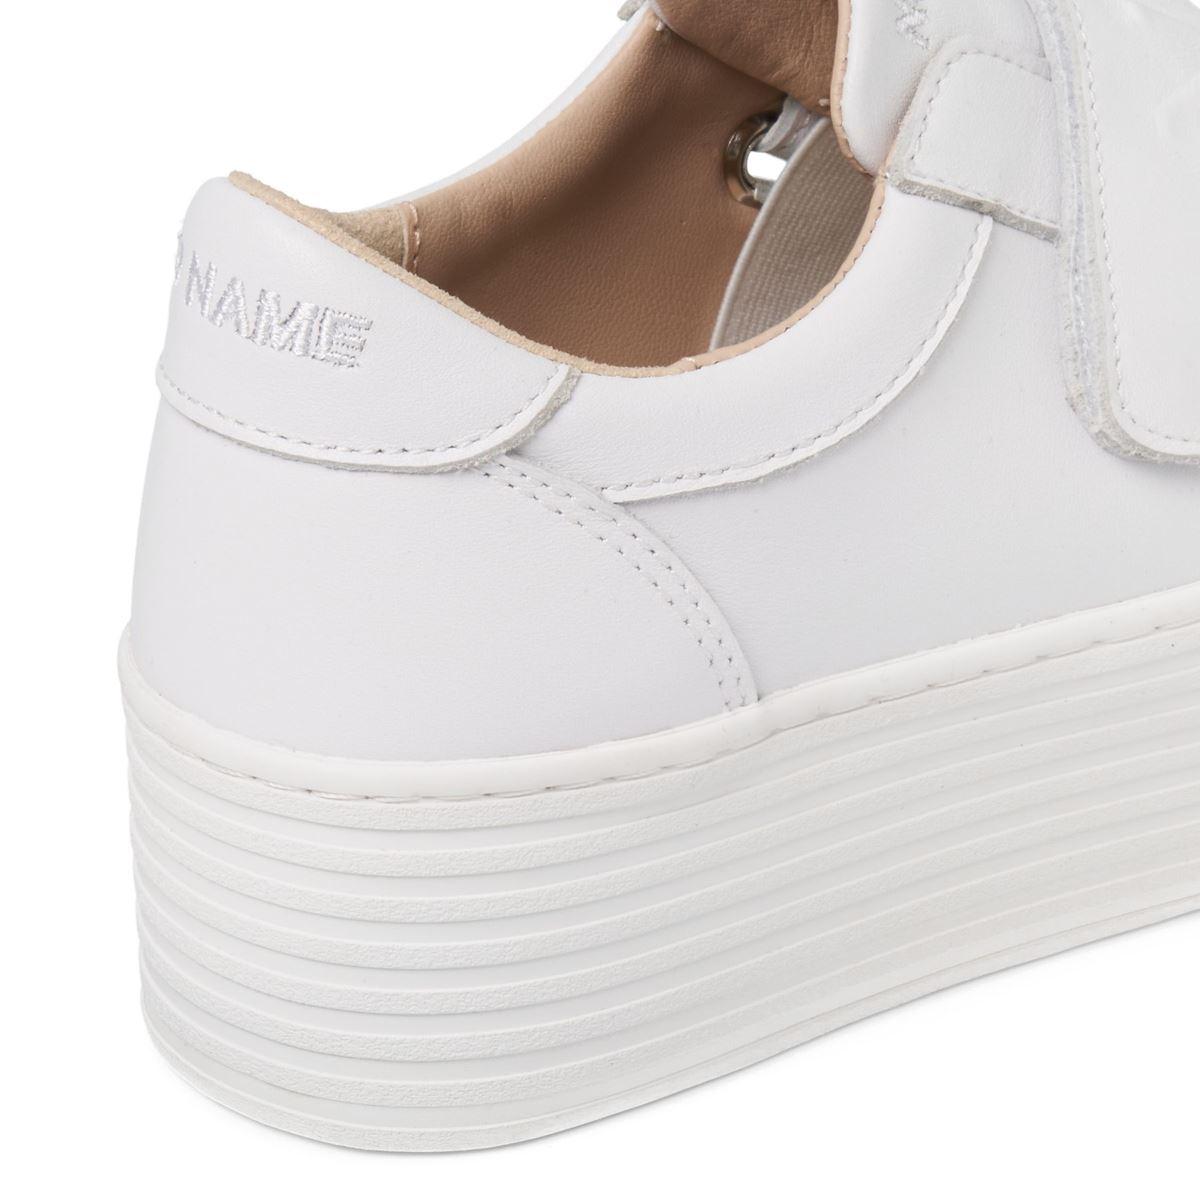 SPICE-11250-WHITE スパイス ホワイト